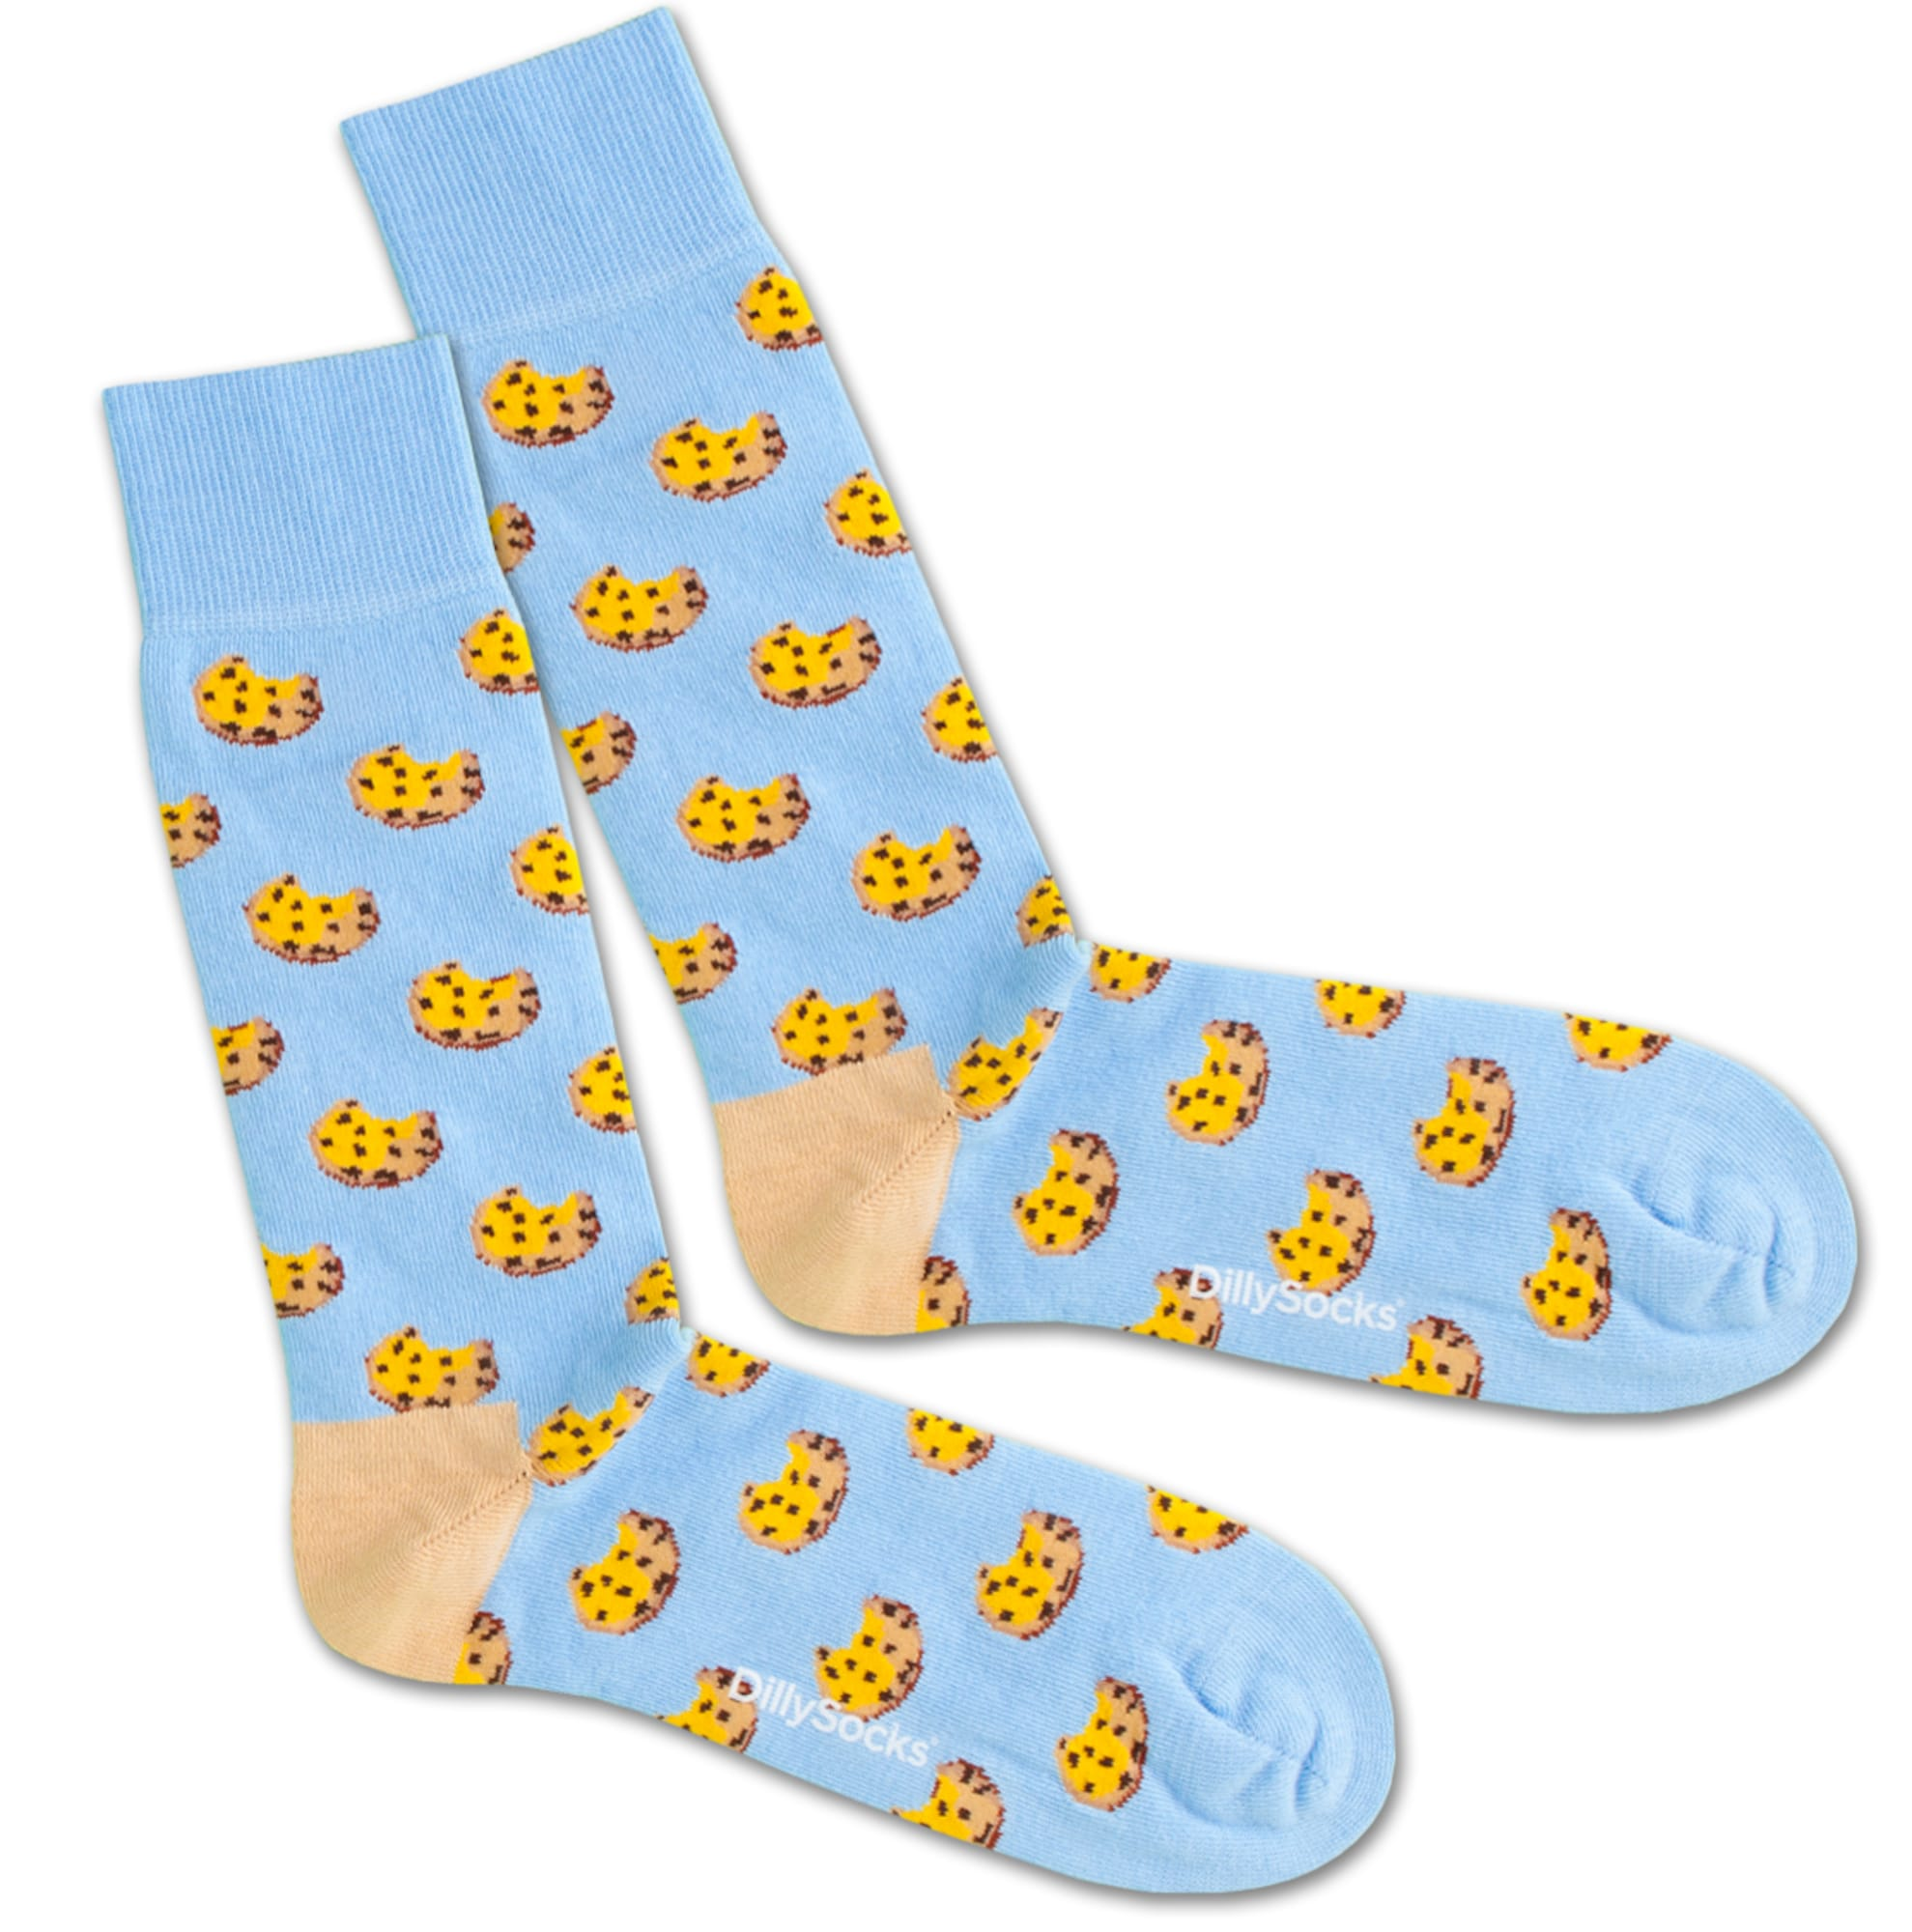 Ponožky Cookie Water modrá žlutá DillySocks